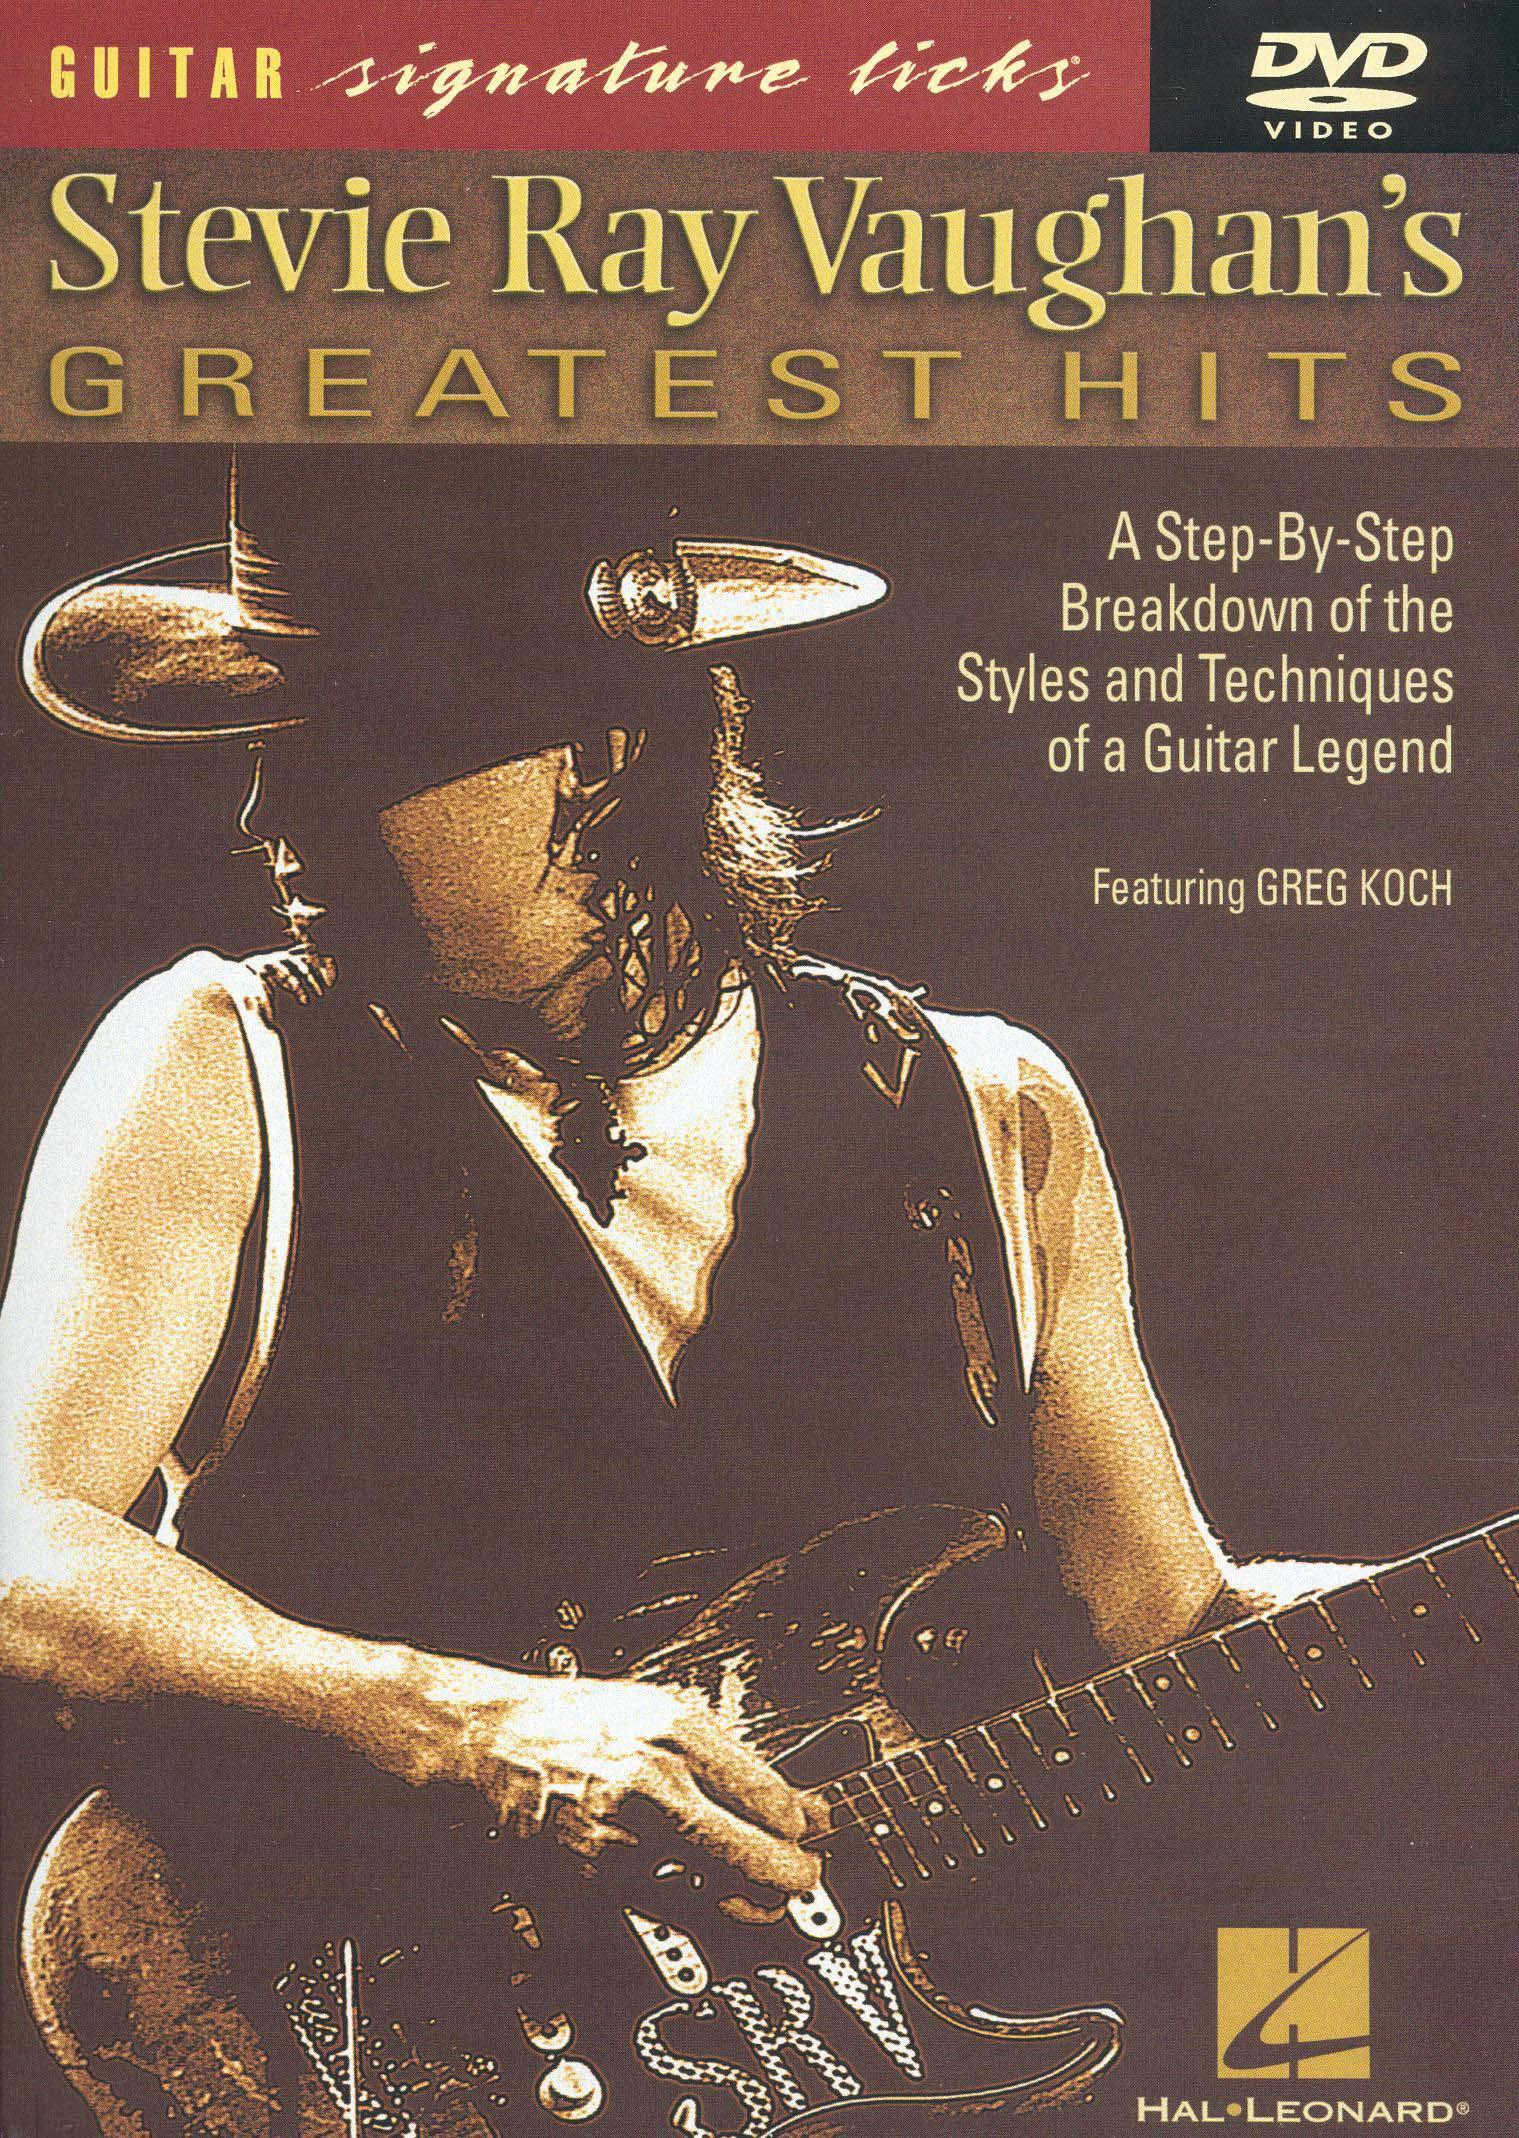 Guitar Signature Licks: Stevie Ray Vaughan's Greatest Hits